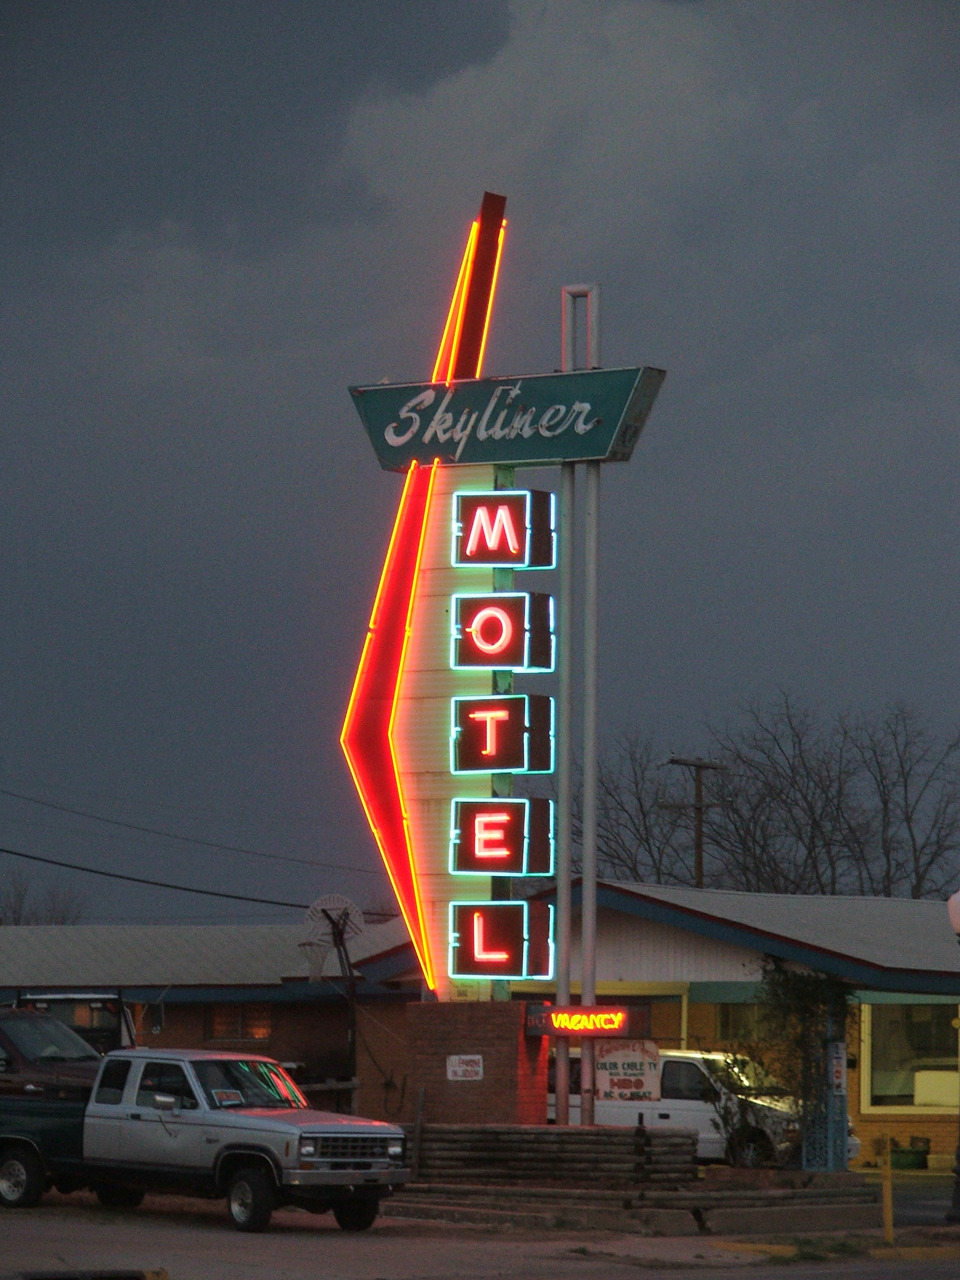 Skyliner Motel - 717 West Main Street, Stroud, Oklahoma U.S.A. - 2006